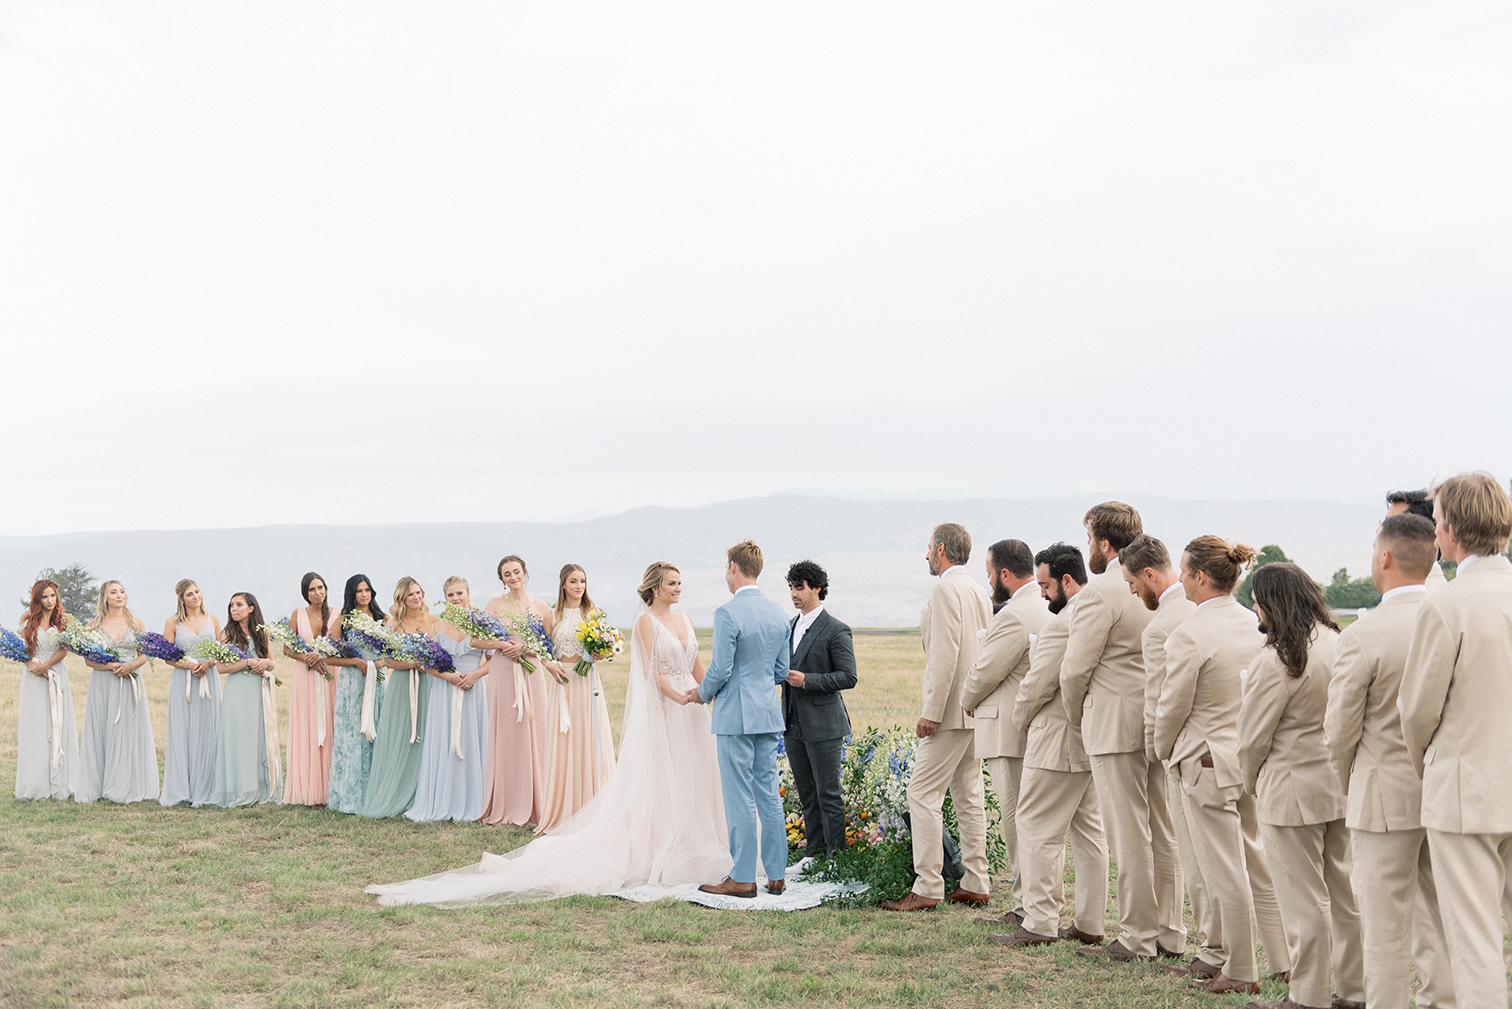 Colorado Photographers, best desintation weddings, mountaintop ceremonies, colorful summer weddings, Denver wedding photographers